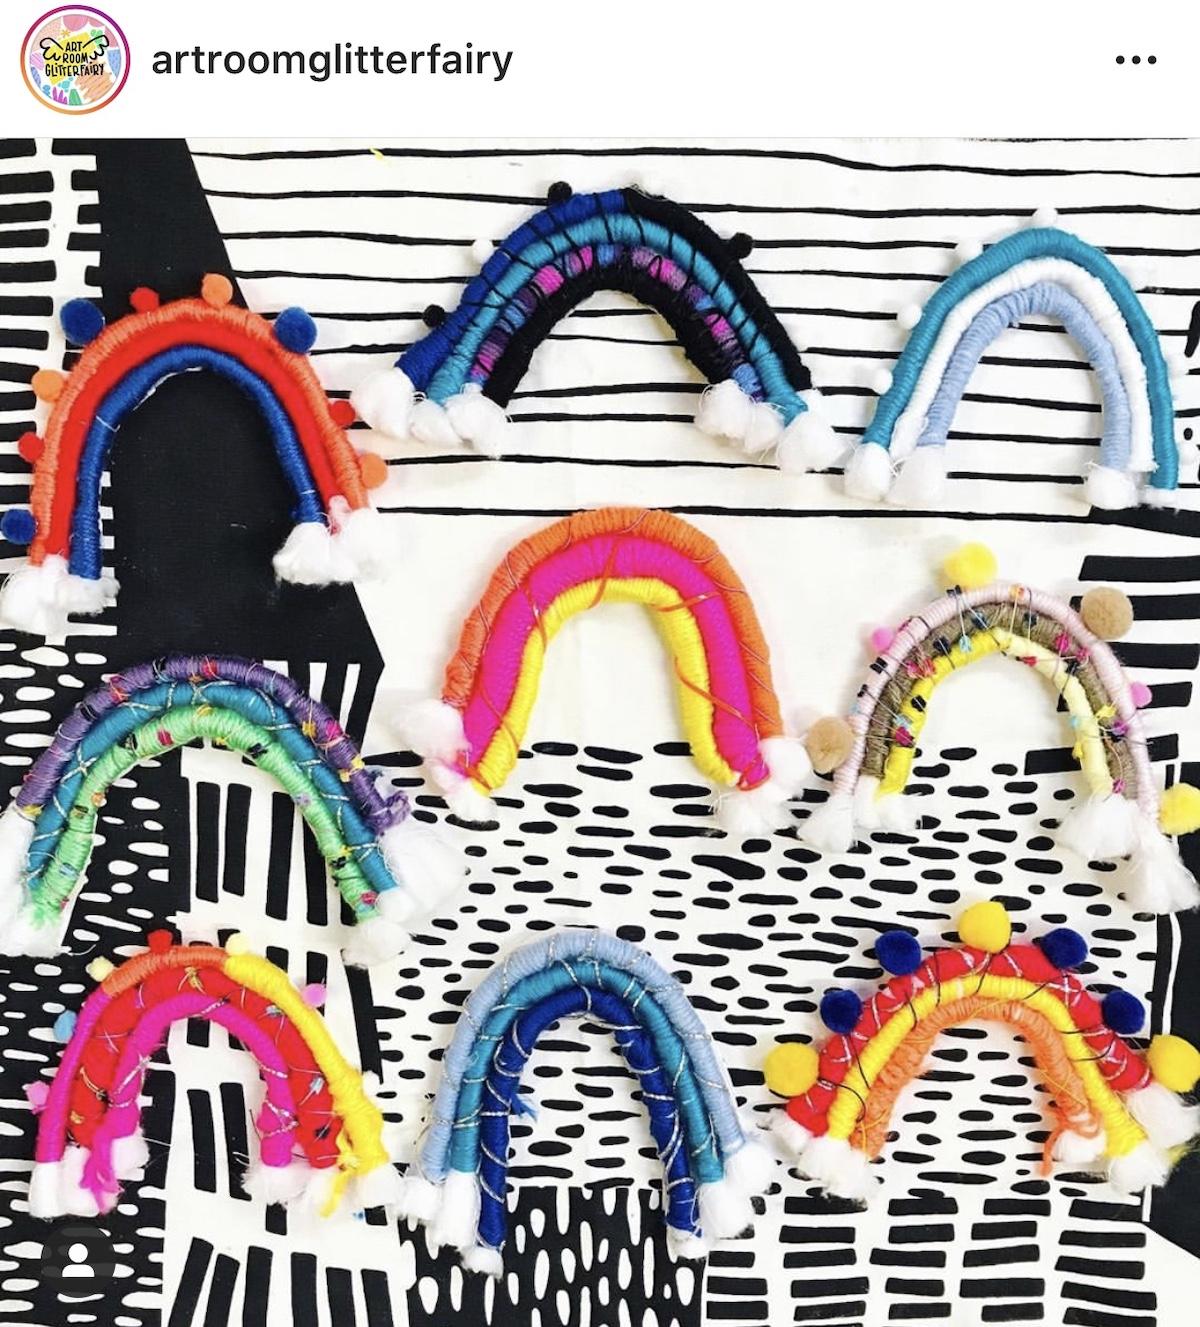 Rainbows made from yarn